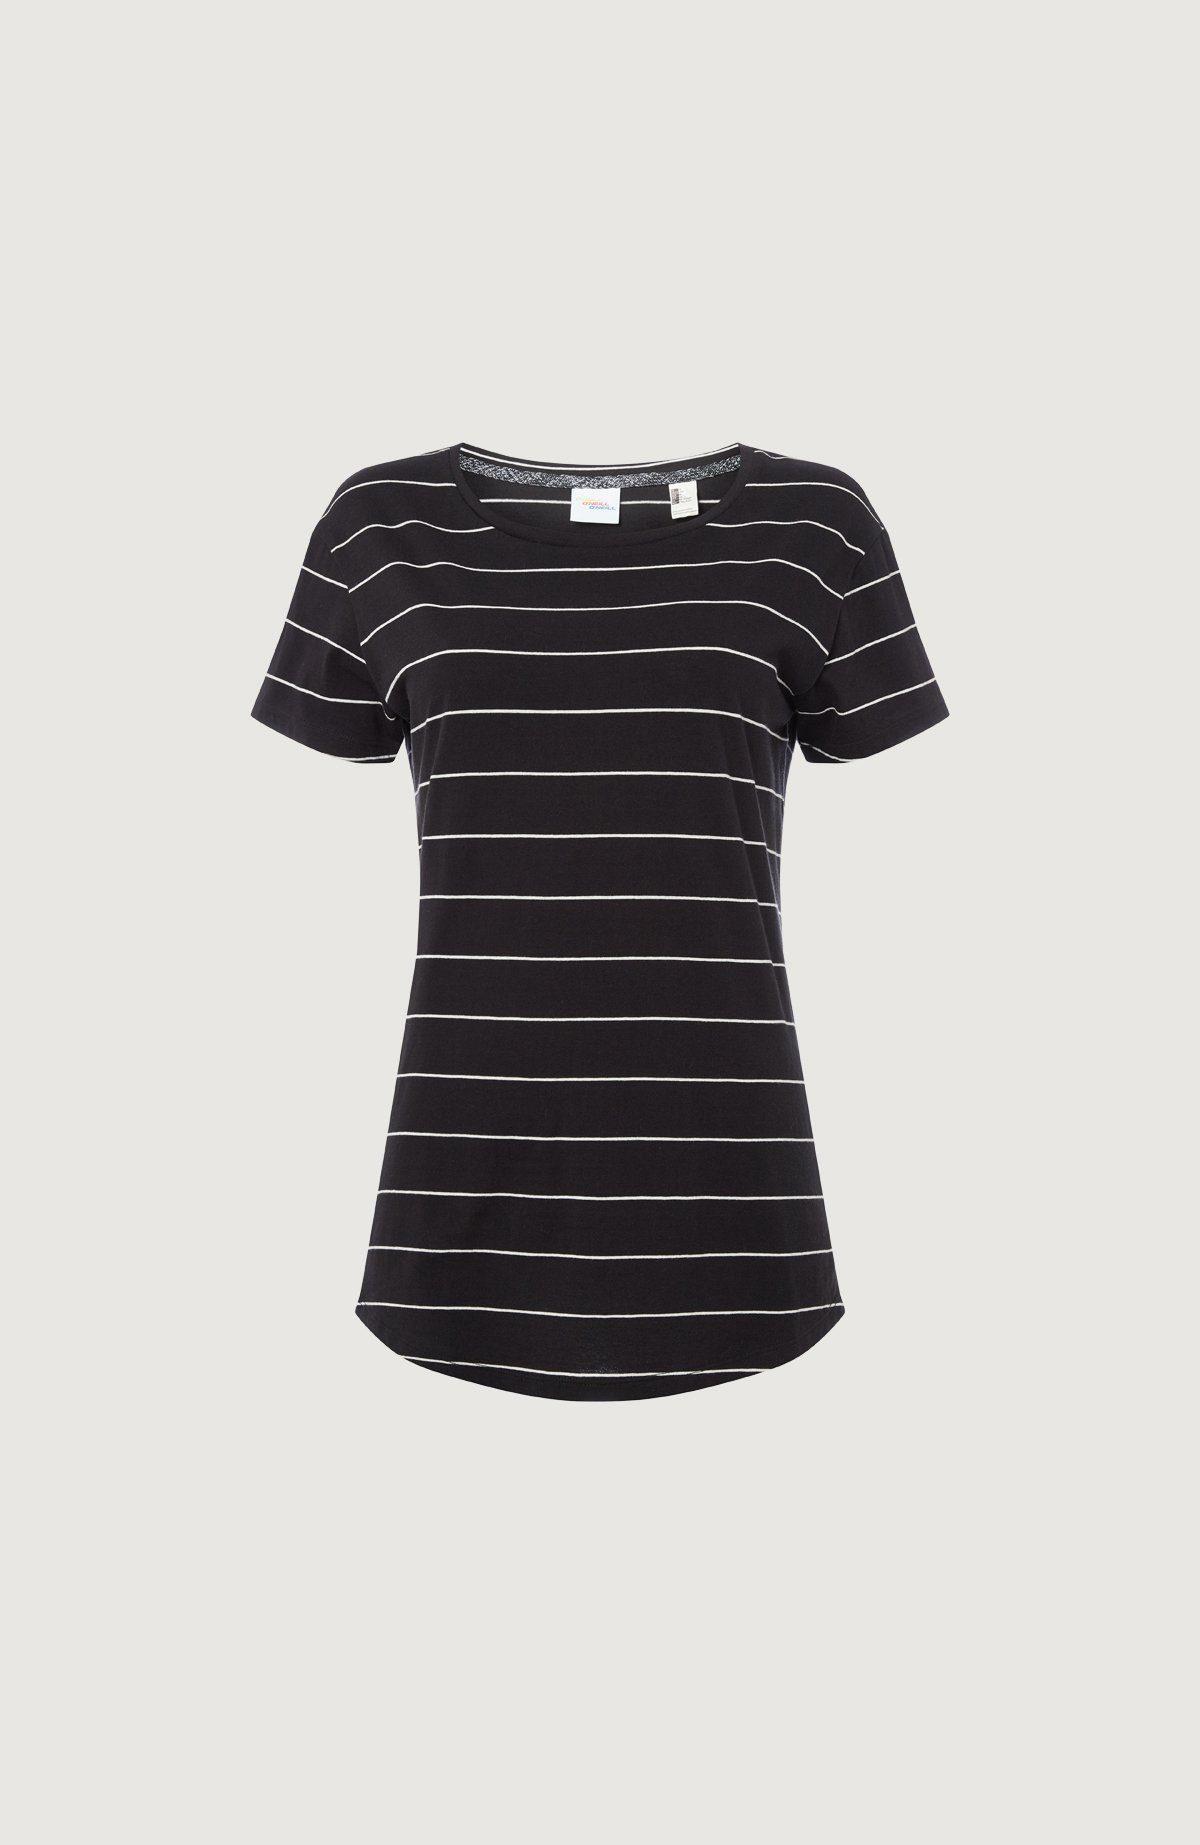 Kaufen Online »stripe T shirt Logo« O'neill xWdCrBoe